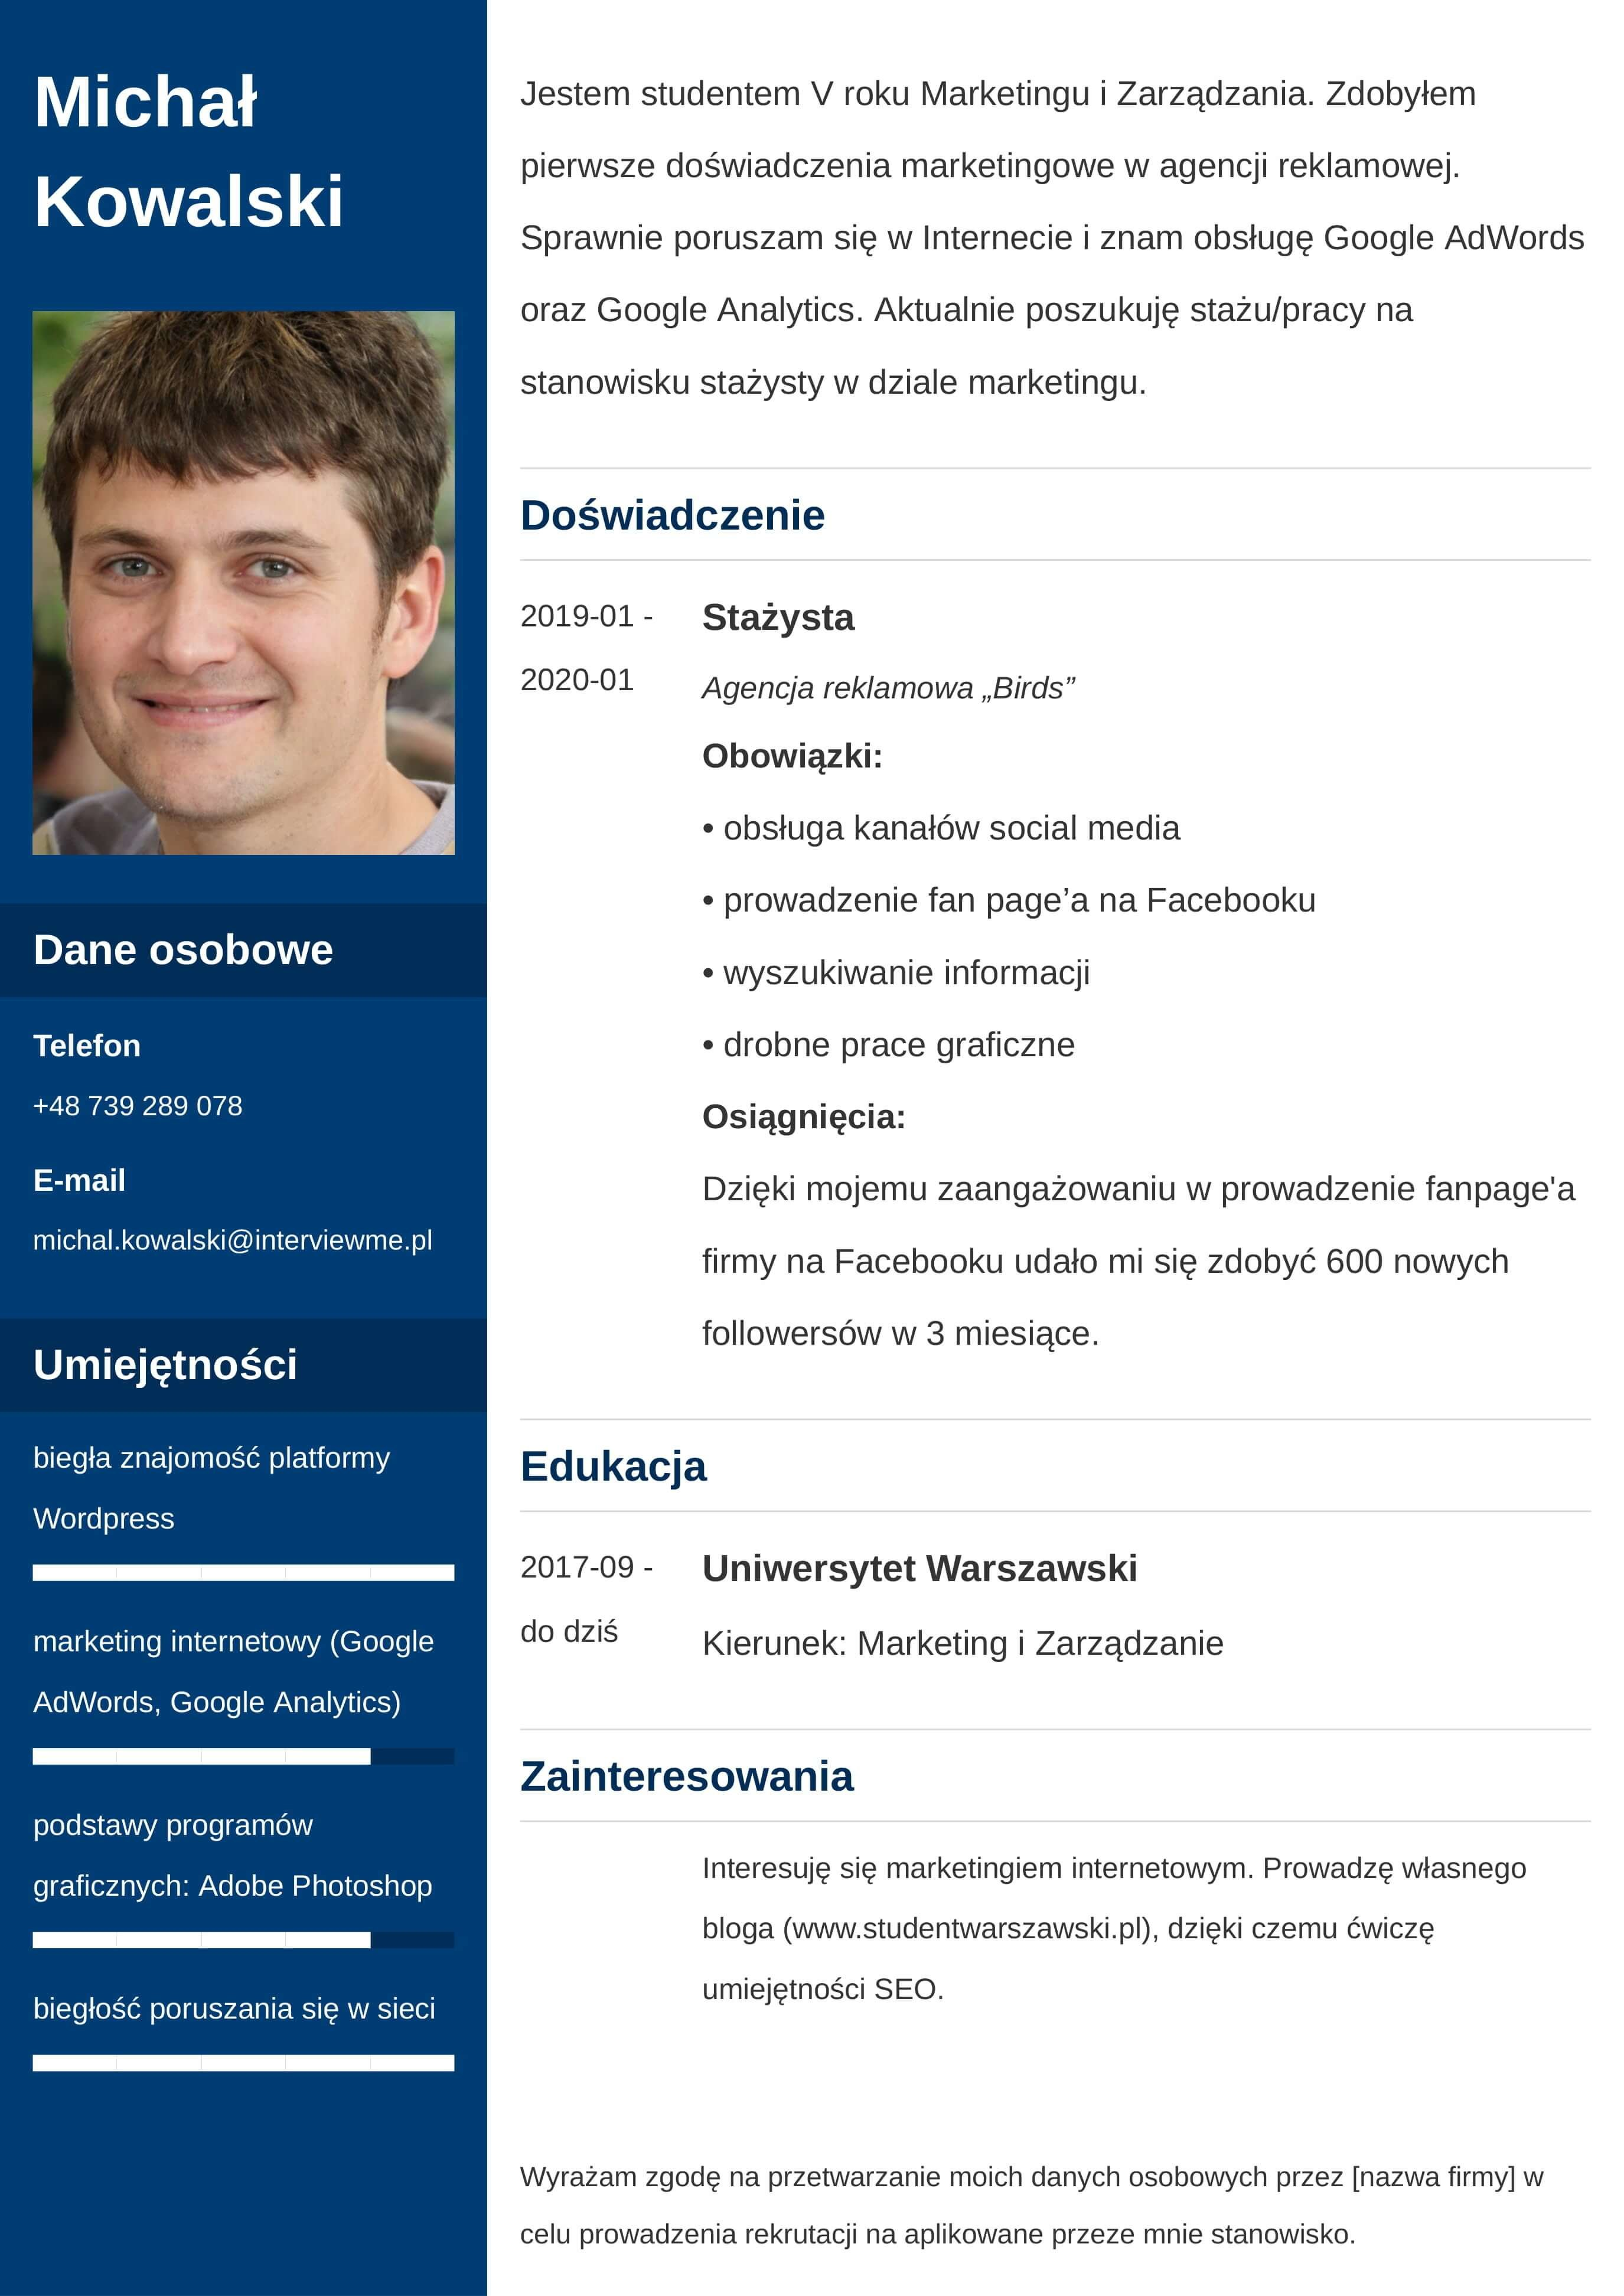 CV wzór dla studenta